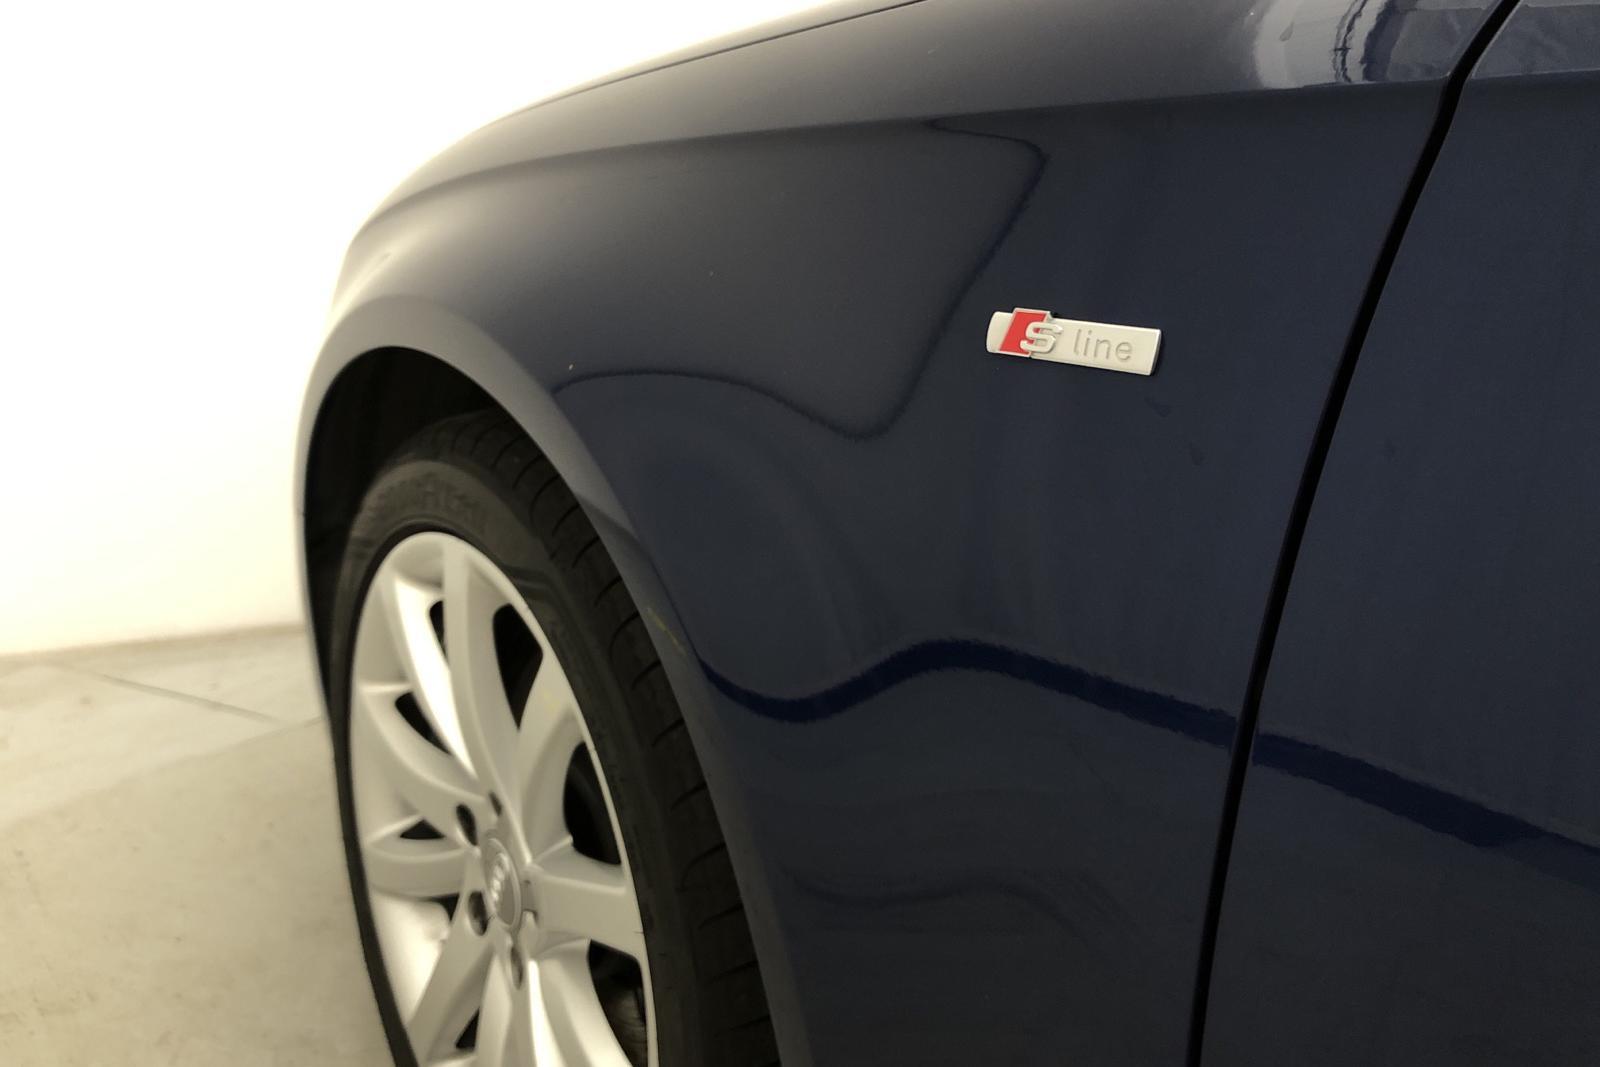 Audi A4 2.0 TFSI E85 Avant quattro (180hk) - 106 400 km - Manual - blue - 2015